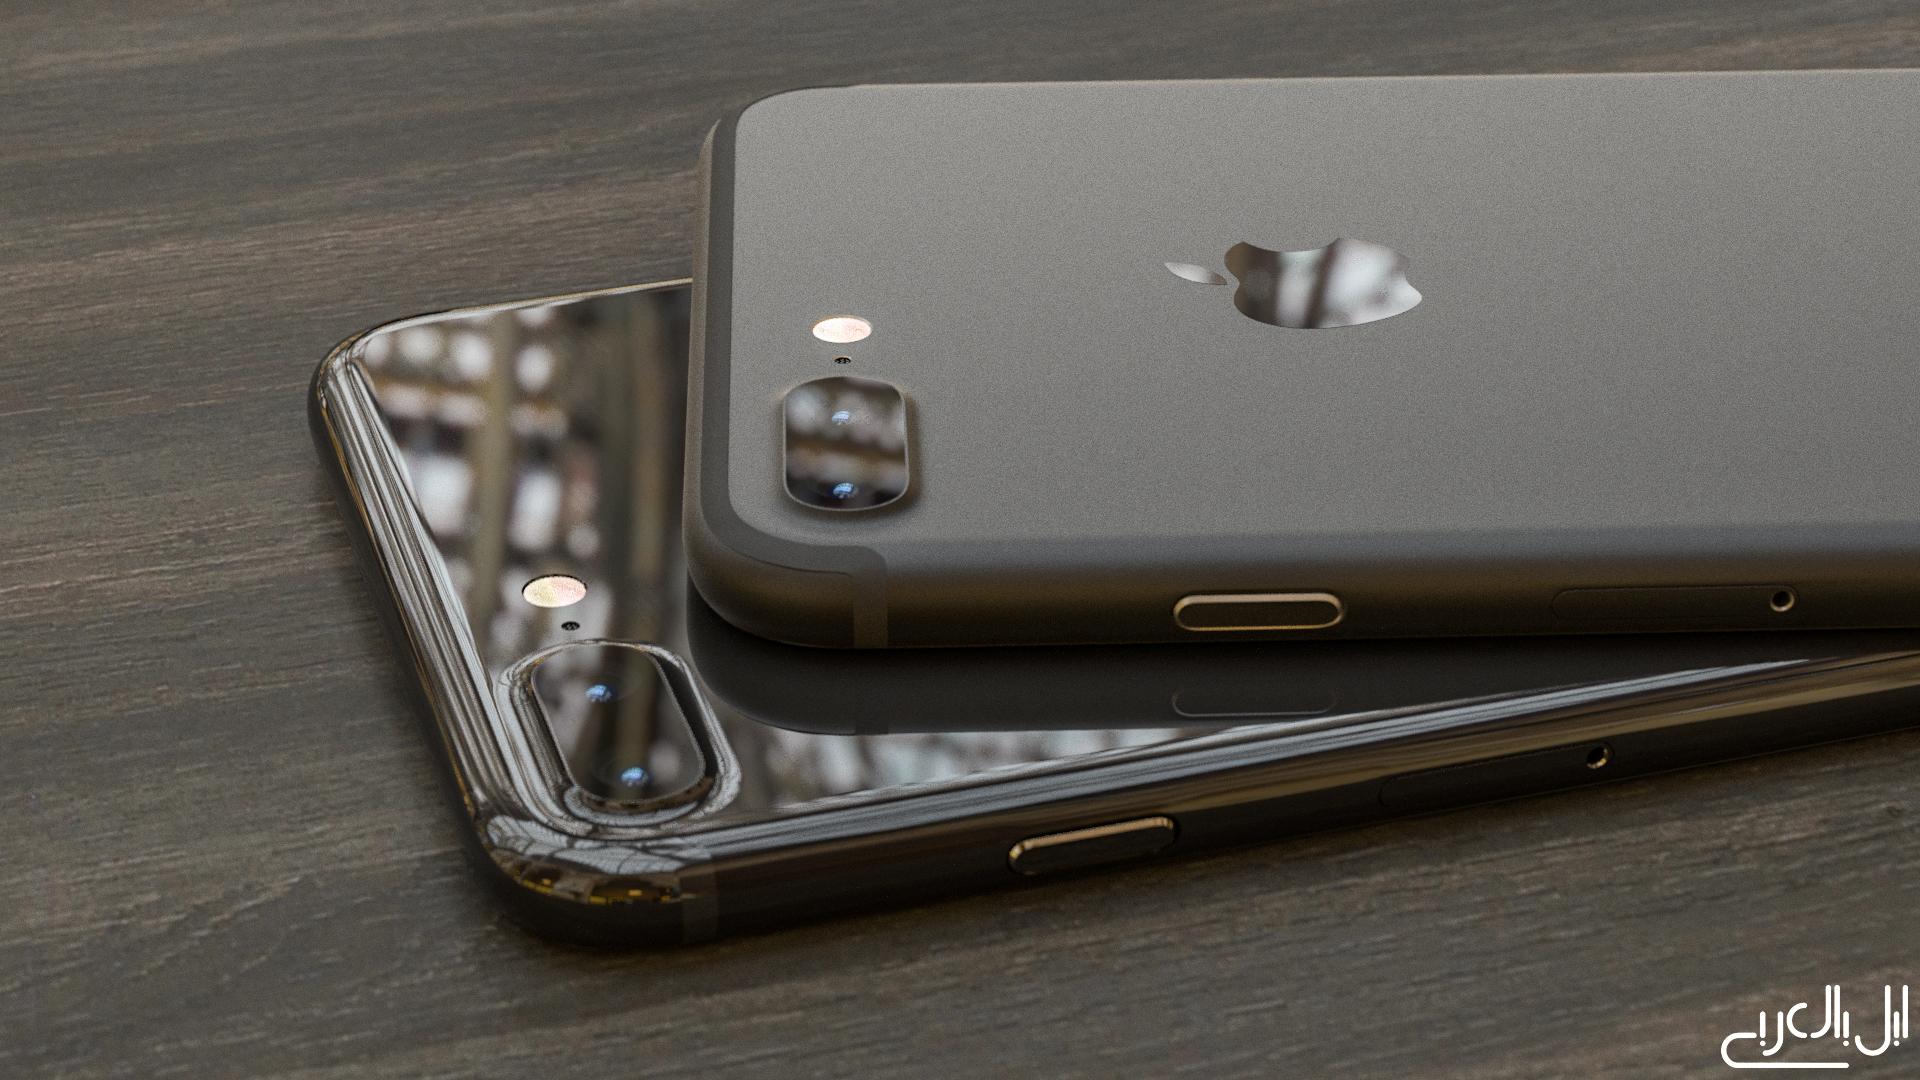 iPhone 7 Plus Matt vs Glossy Black Corona